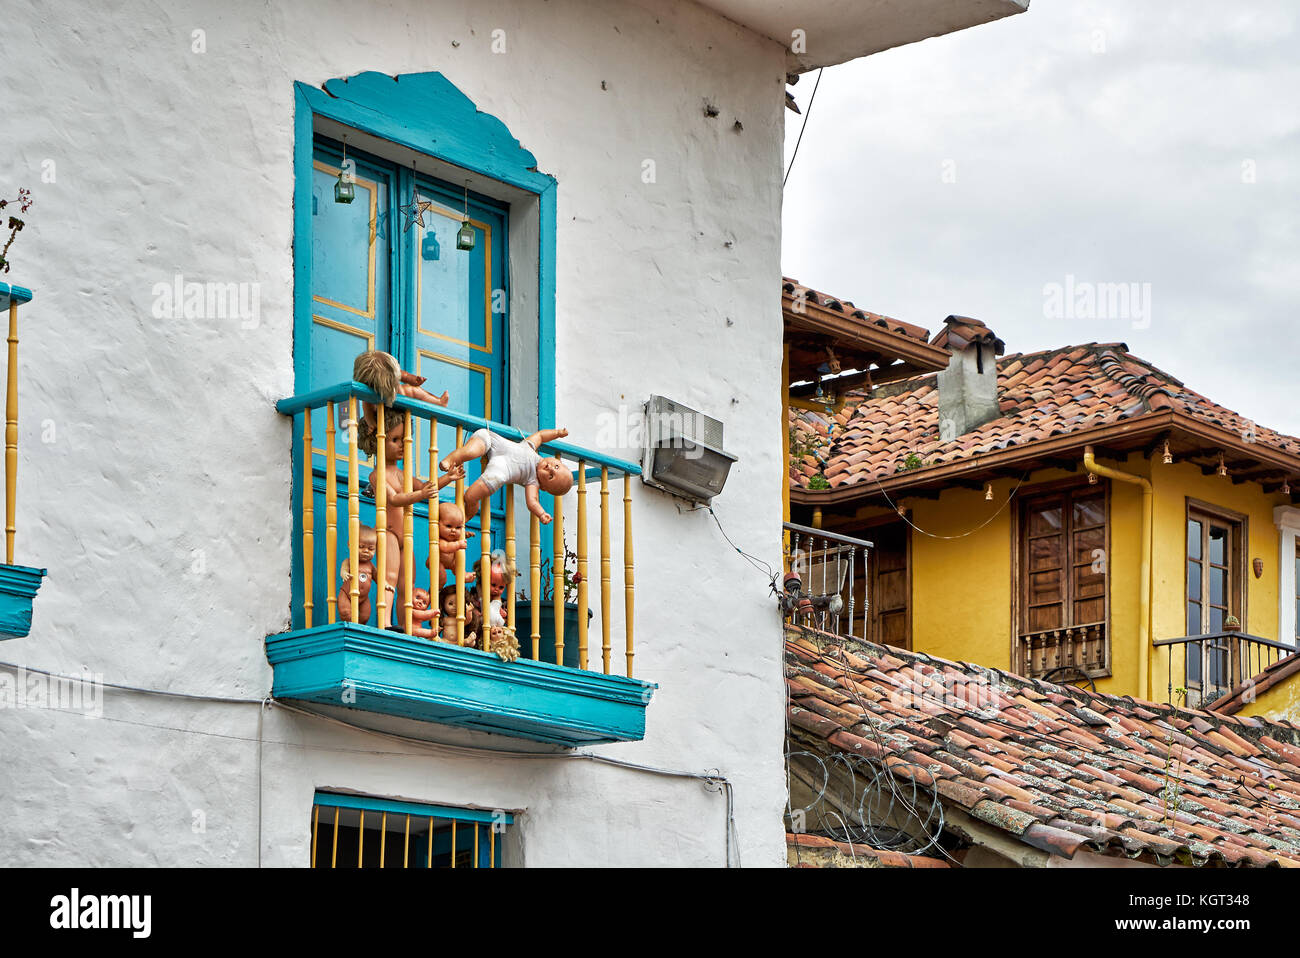 Typisches Gebaeude im Stadtteil La Candelaria, Bogota, Kolumbien, Suedamerika |typical building in La Candelaria, - Stock Image